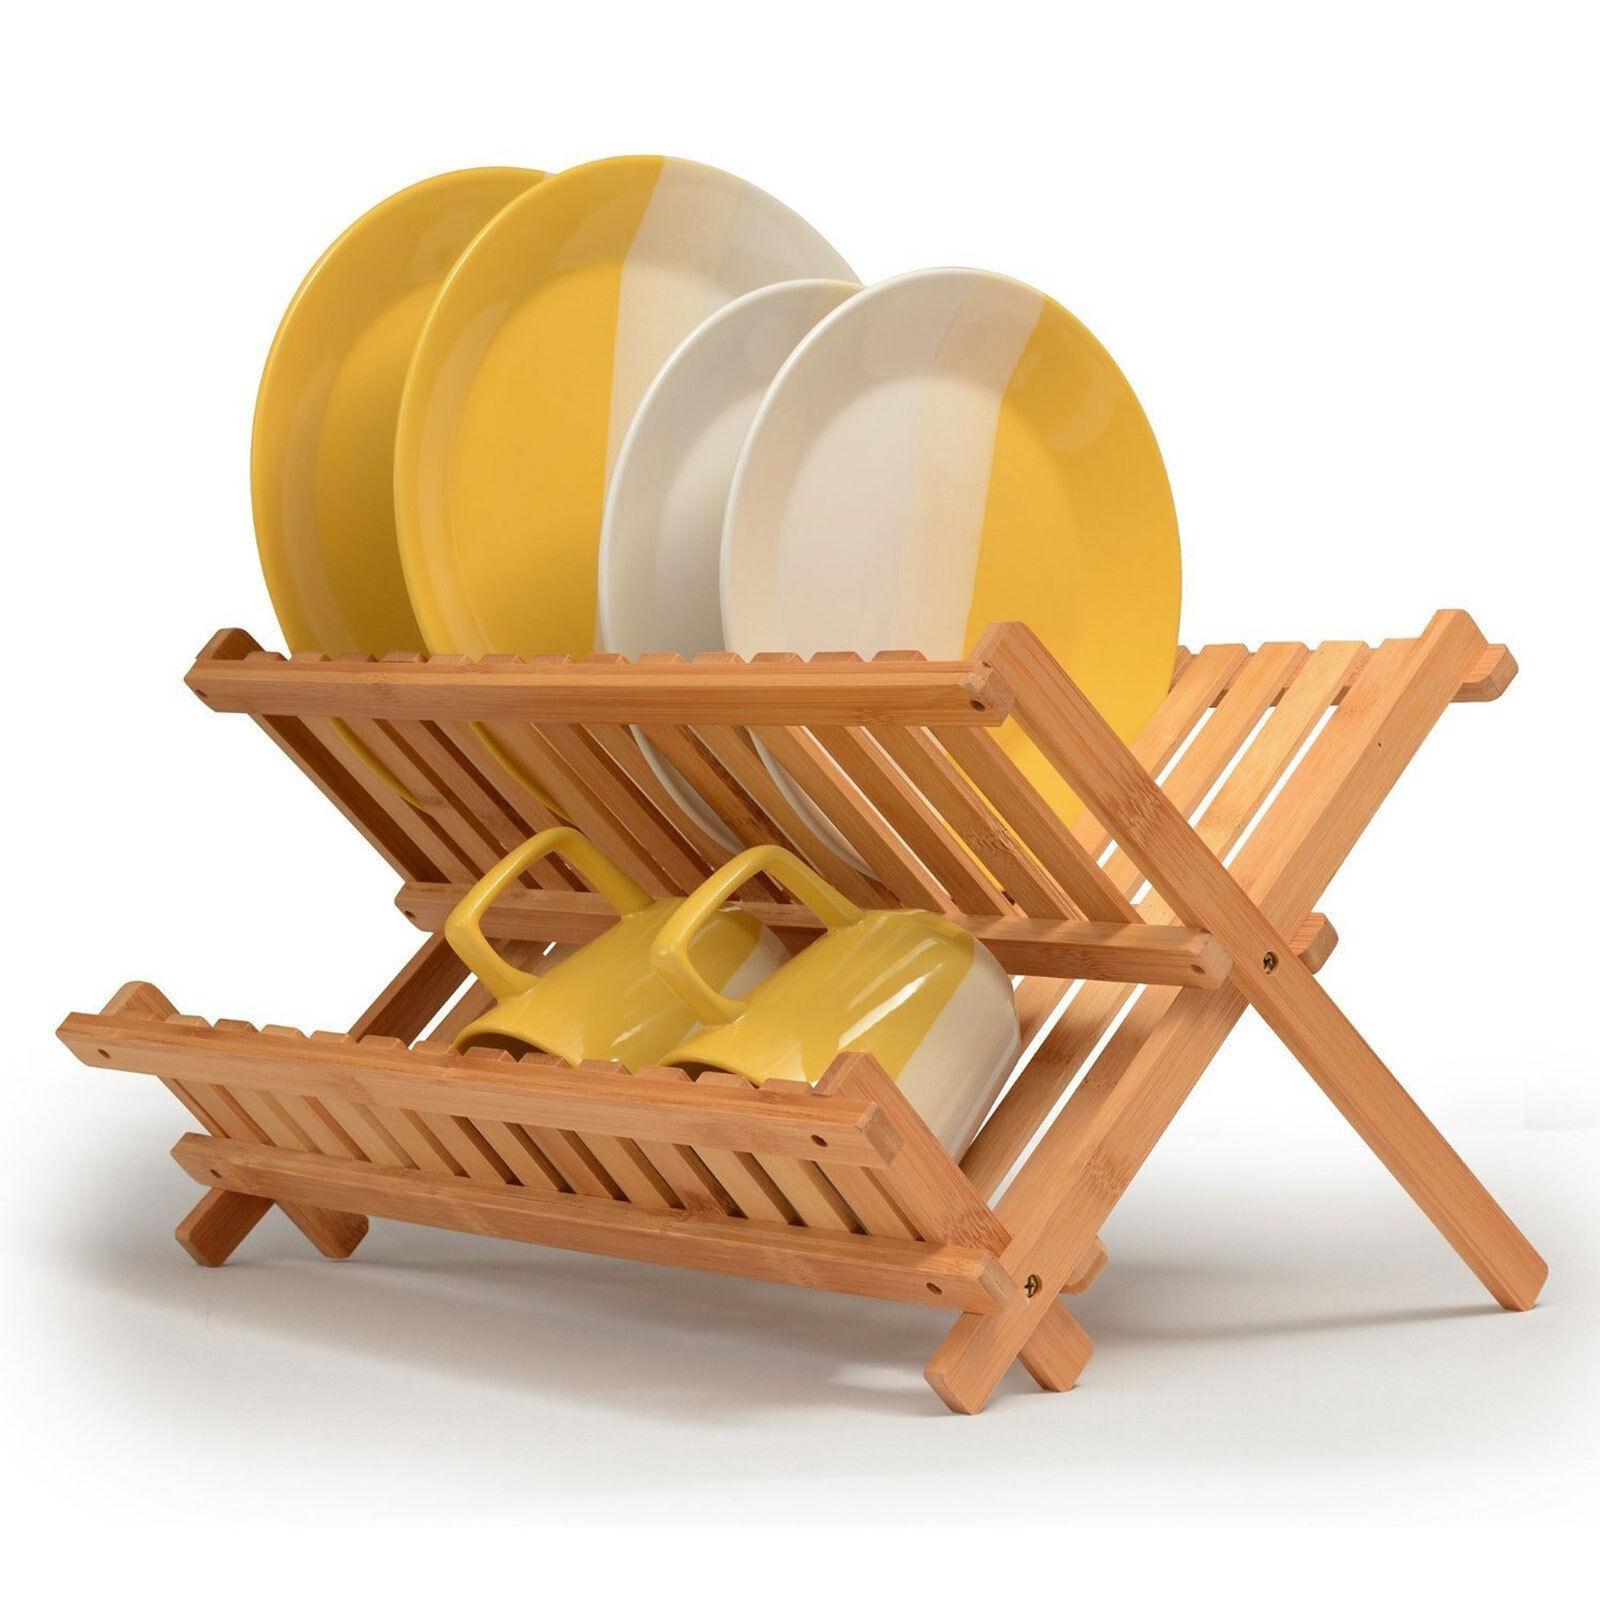 Bamboo Wood Dish Drainer Dinner Plates Rack Stand Cutlery Utensil Holder Dryer